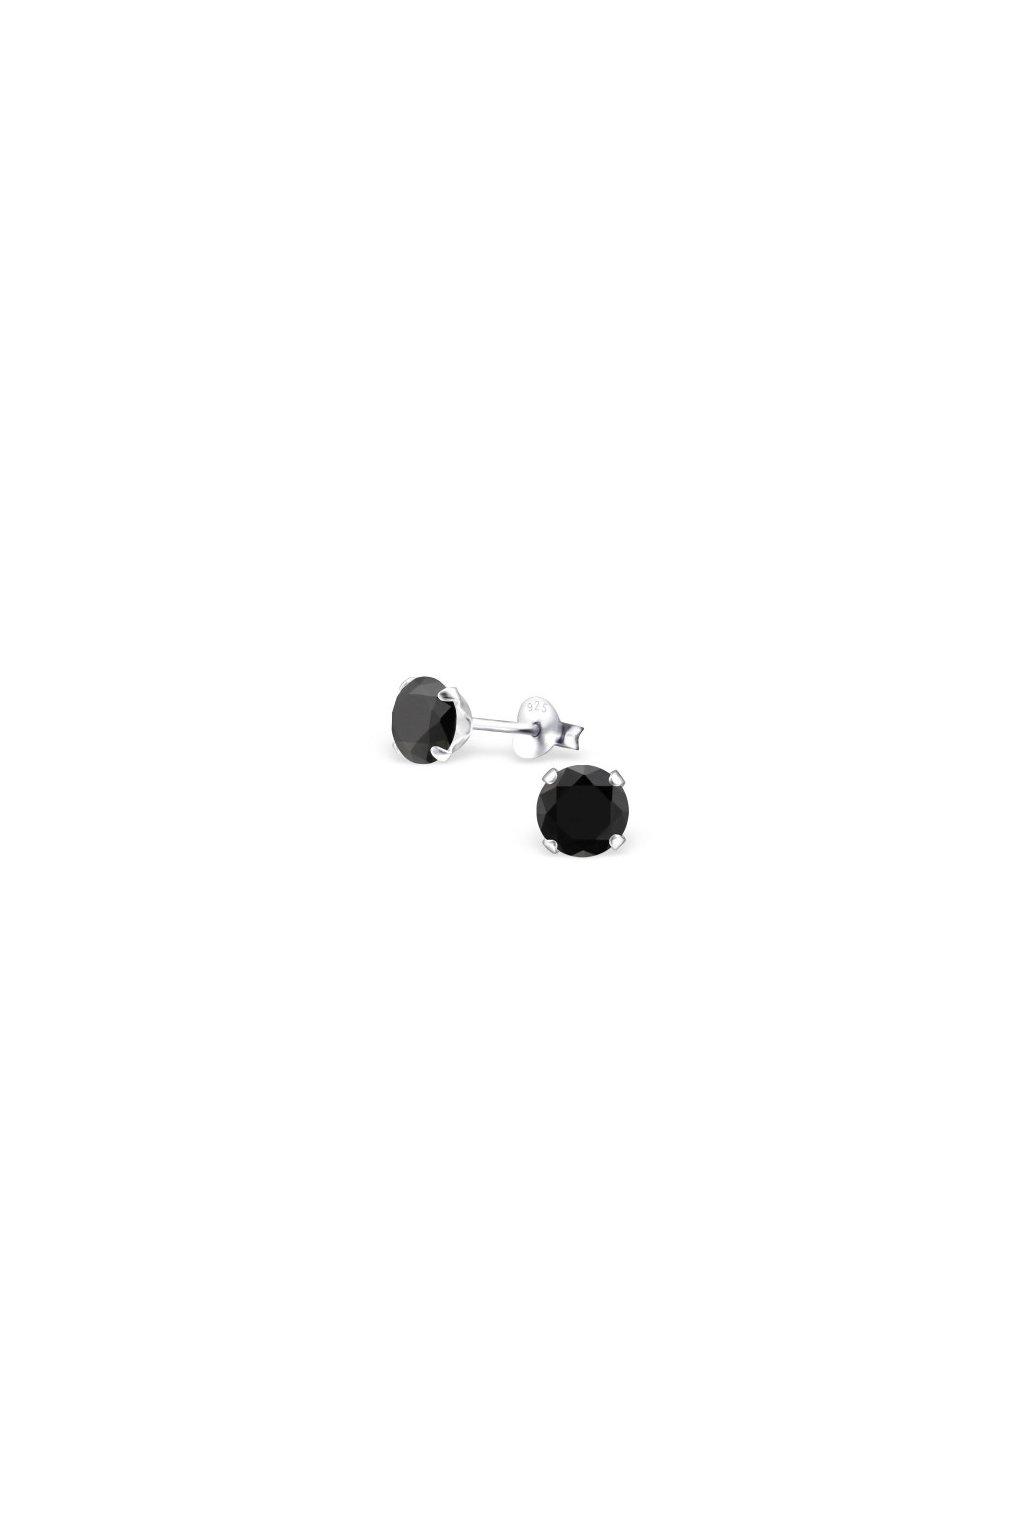 Strieborné náušnice bodky - 925 cz čierny kryštál MS5056